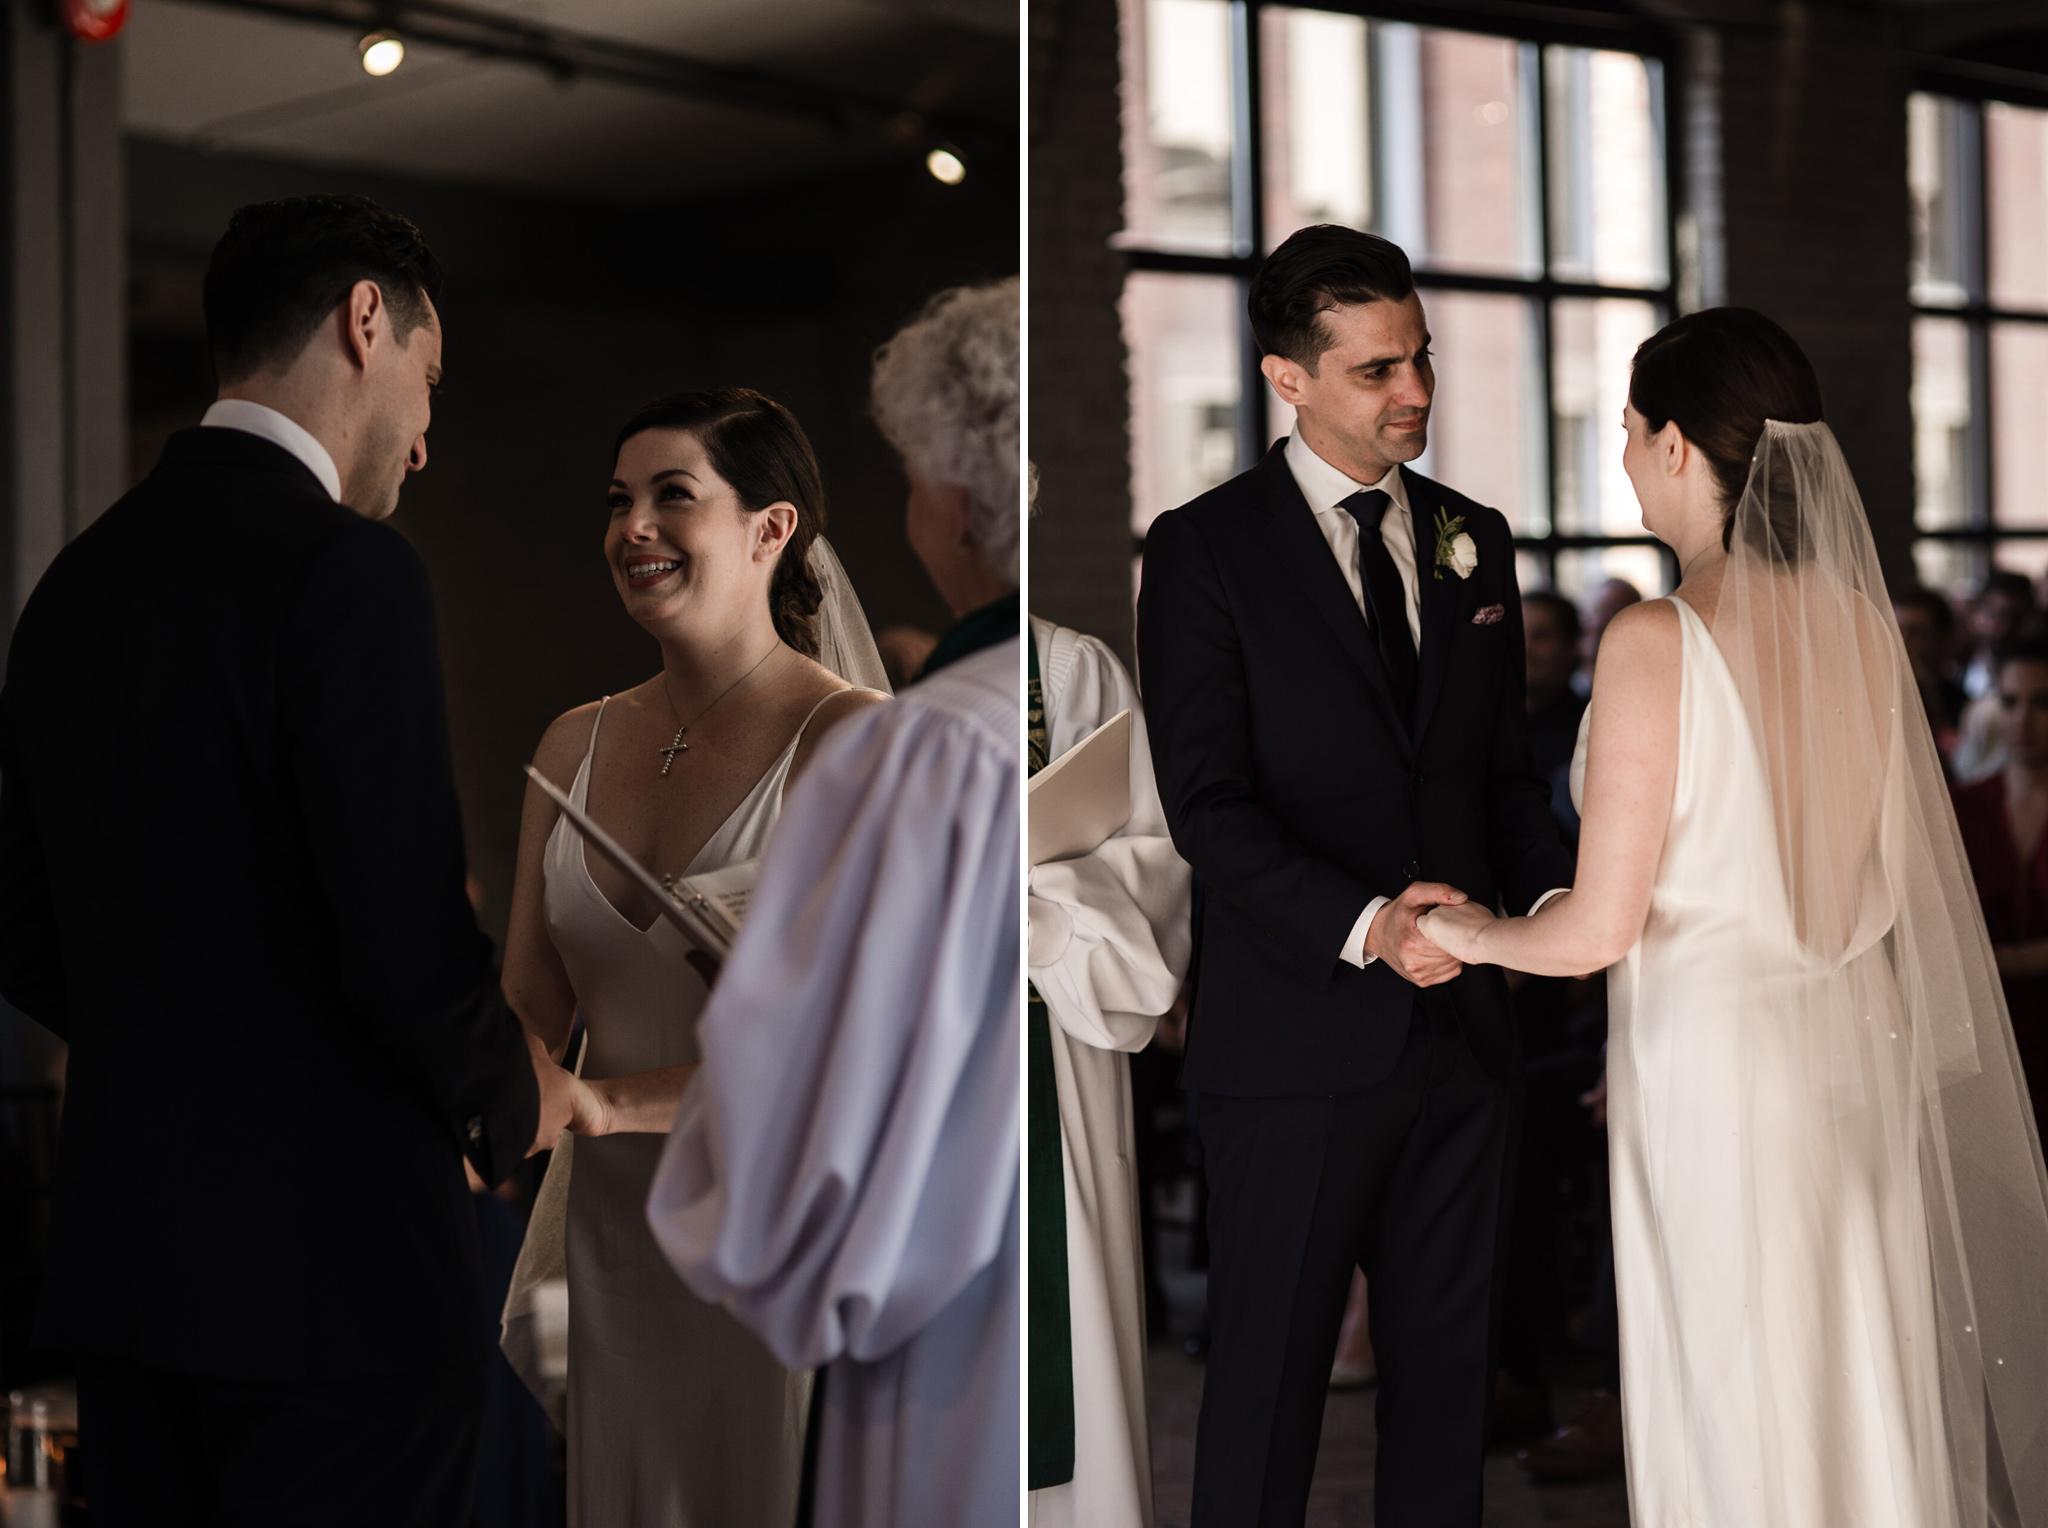 105-wedding-ceremony-storys-building-toronto-photographer-documentary.jpg